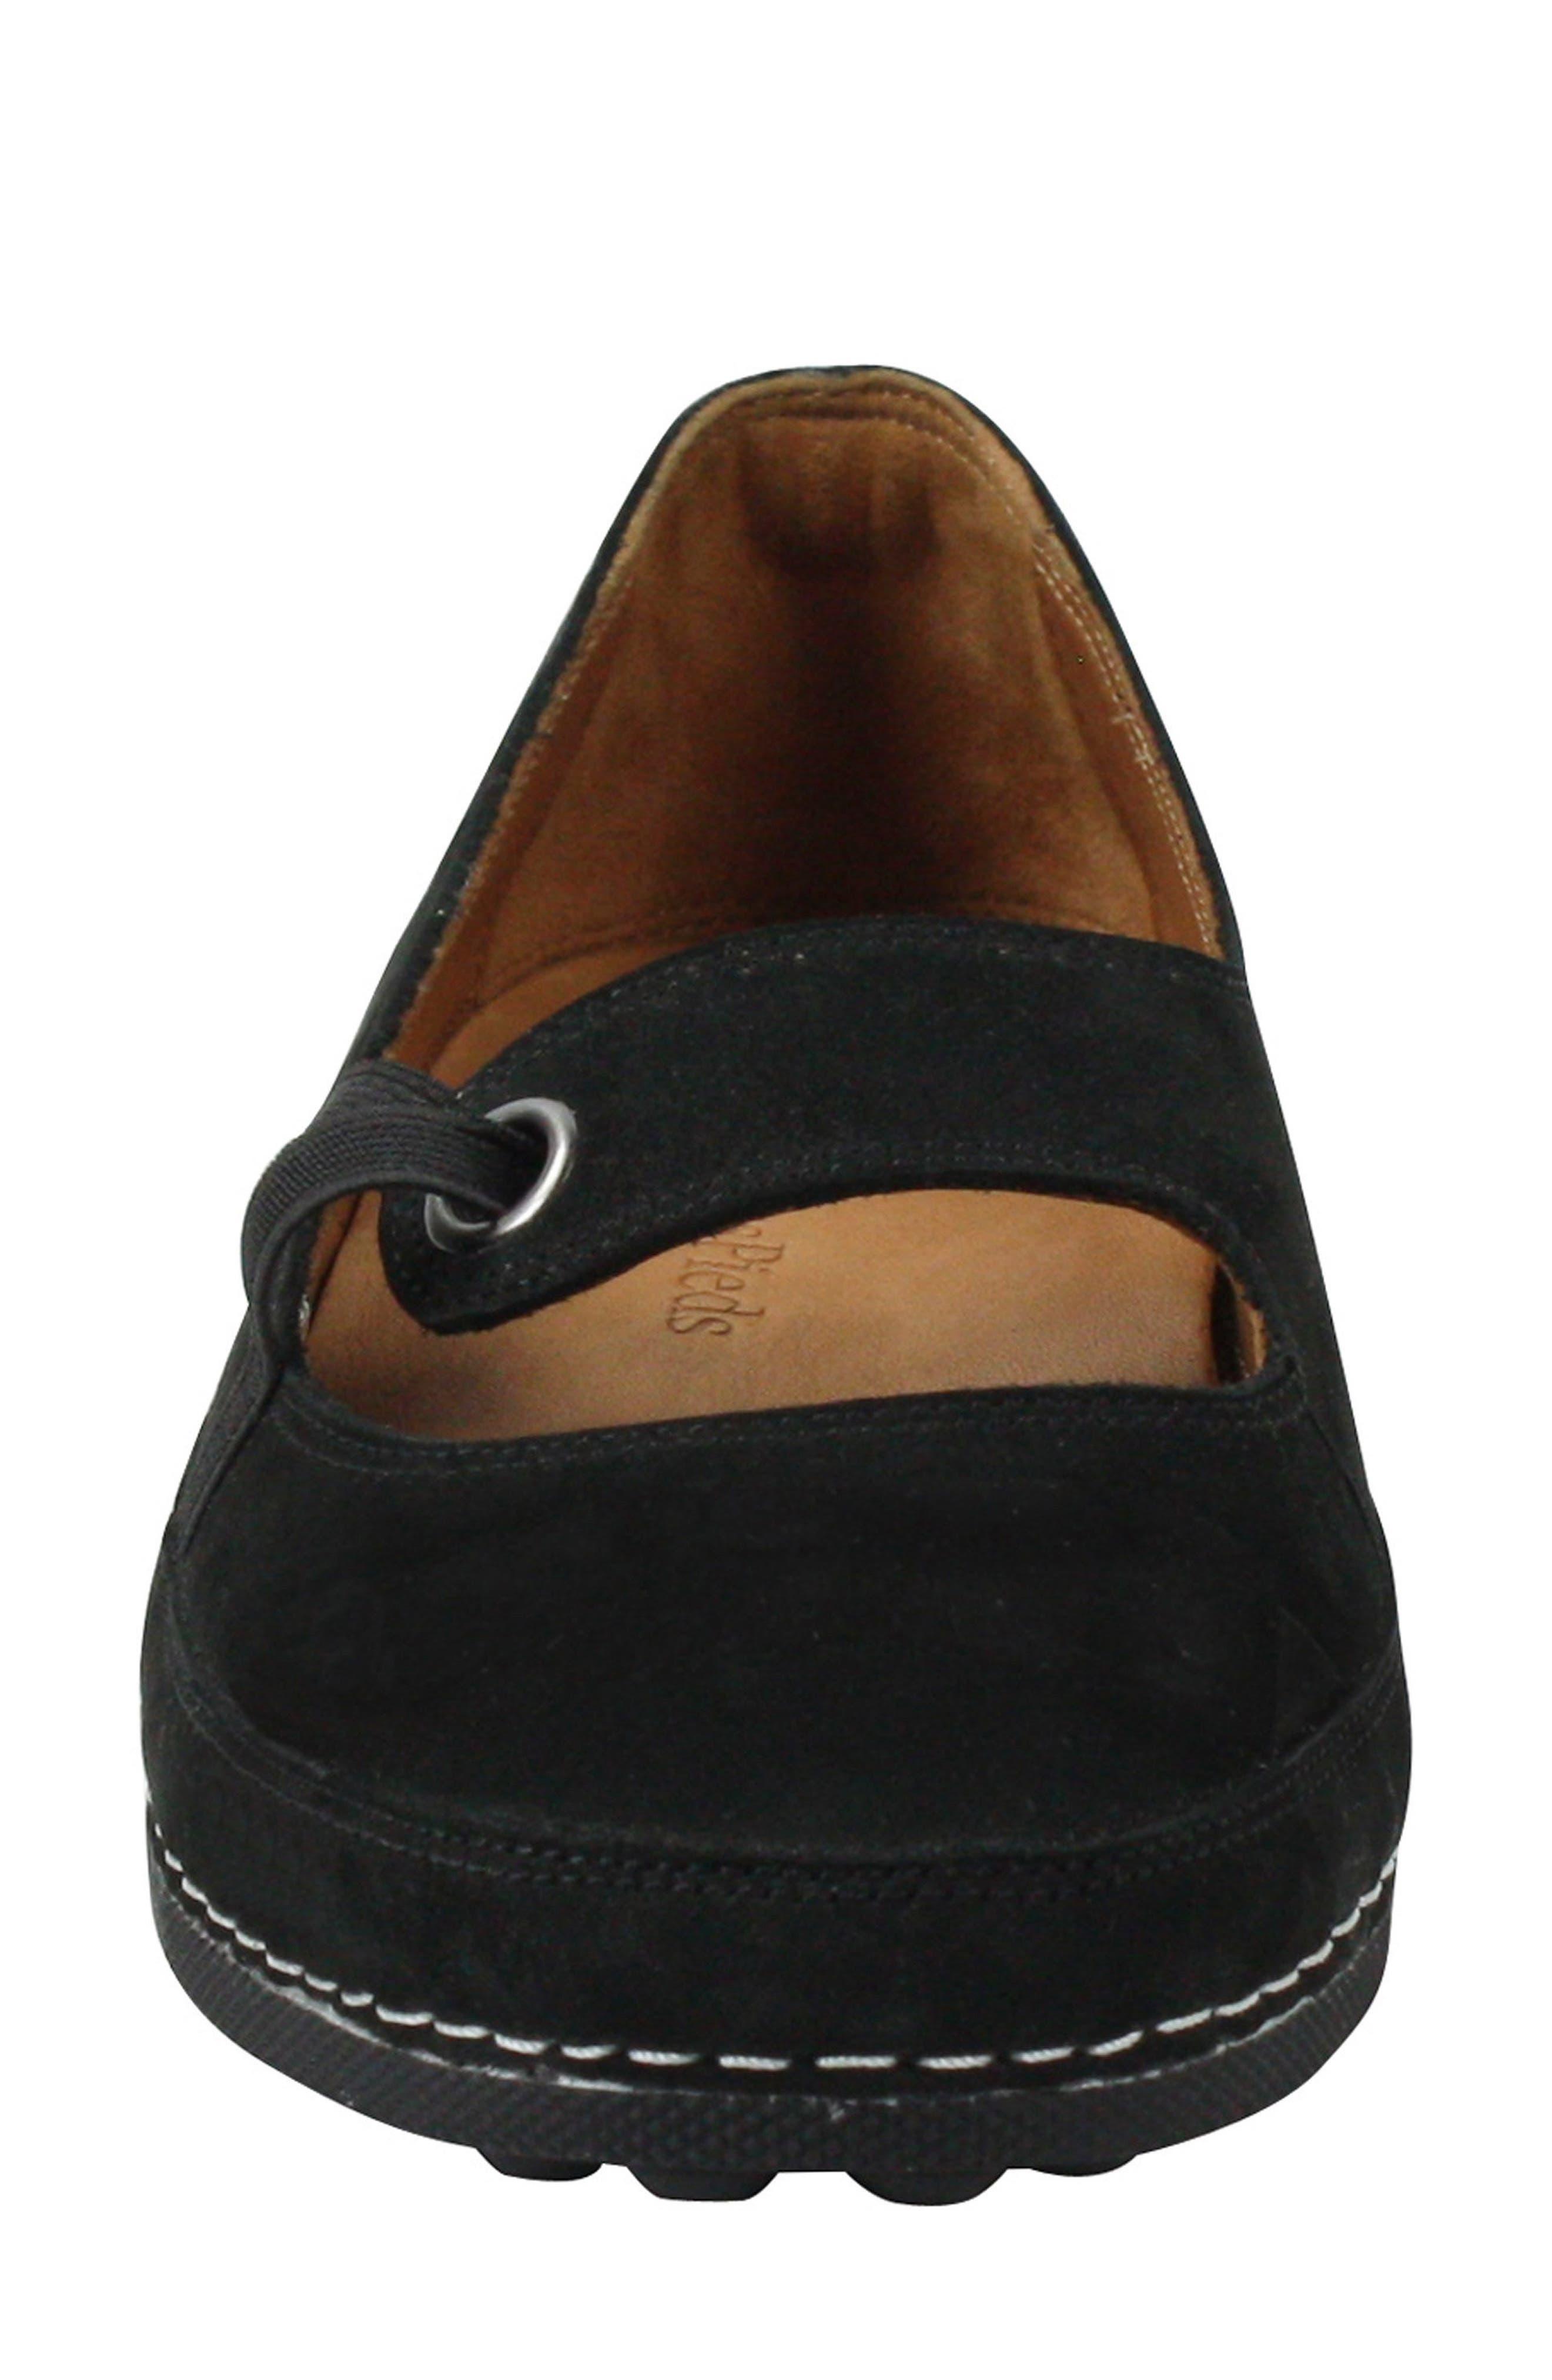 Denisse Mary Jane Flat,                             Alternate thumbnail 4, color,                             Black Nubuck Leather